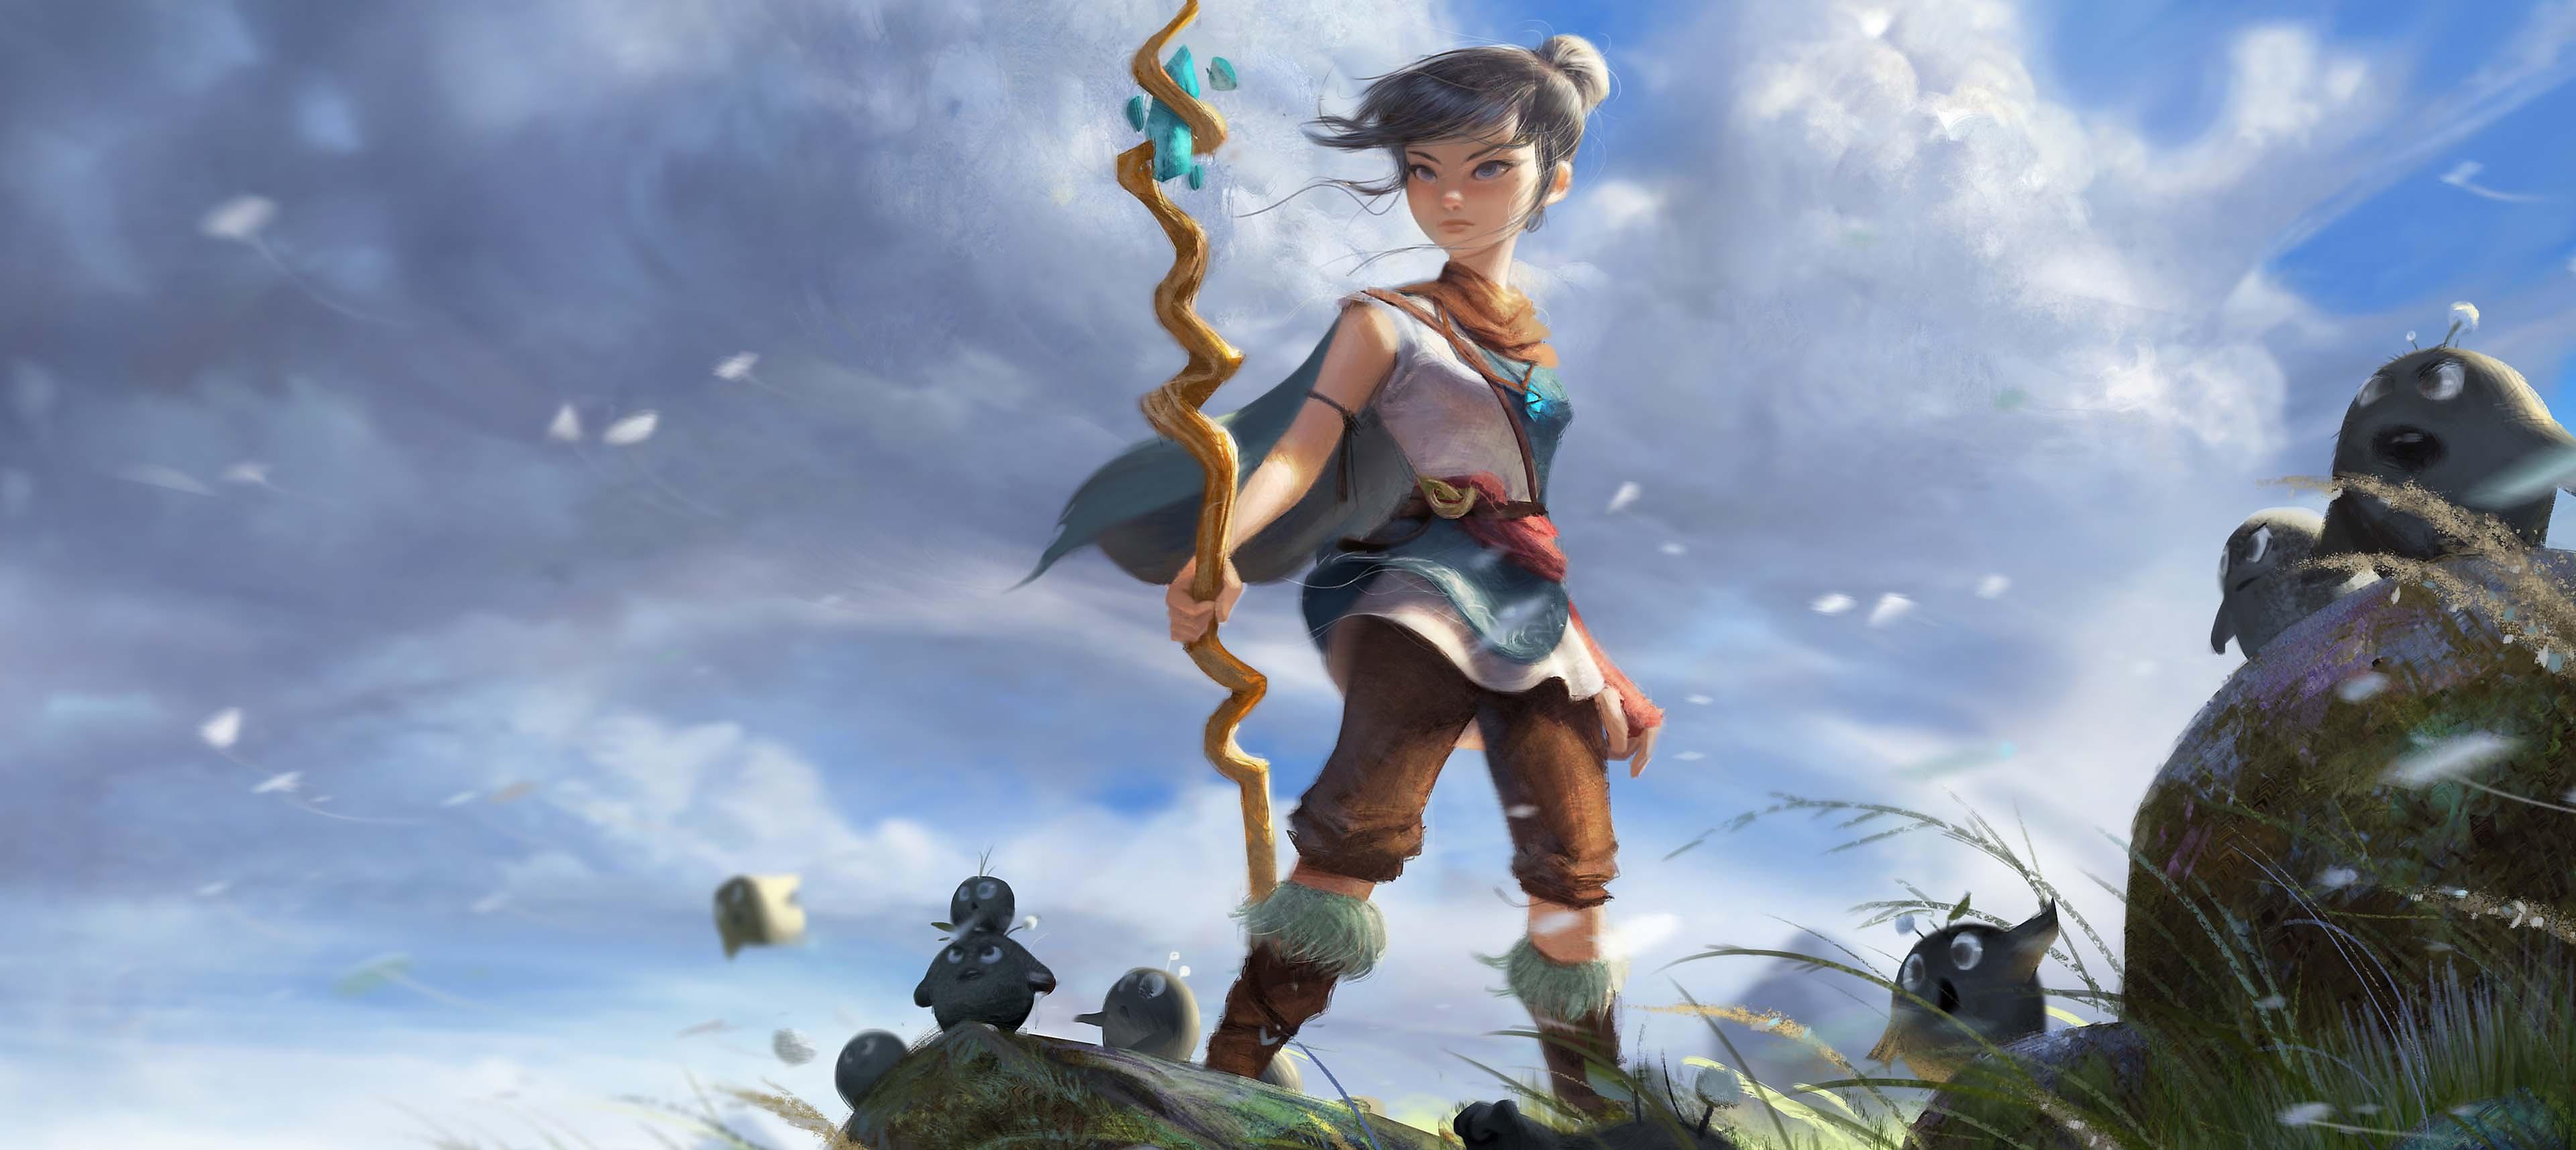 Concept artwork of Kena holding her staff